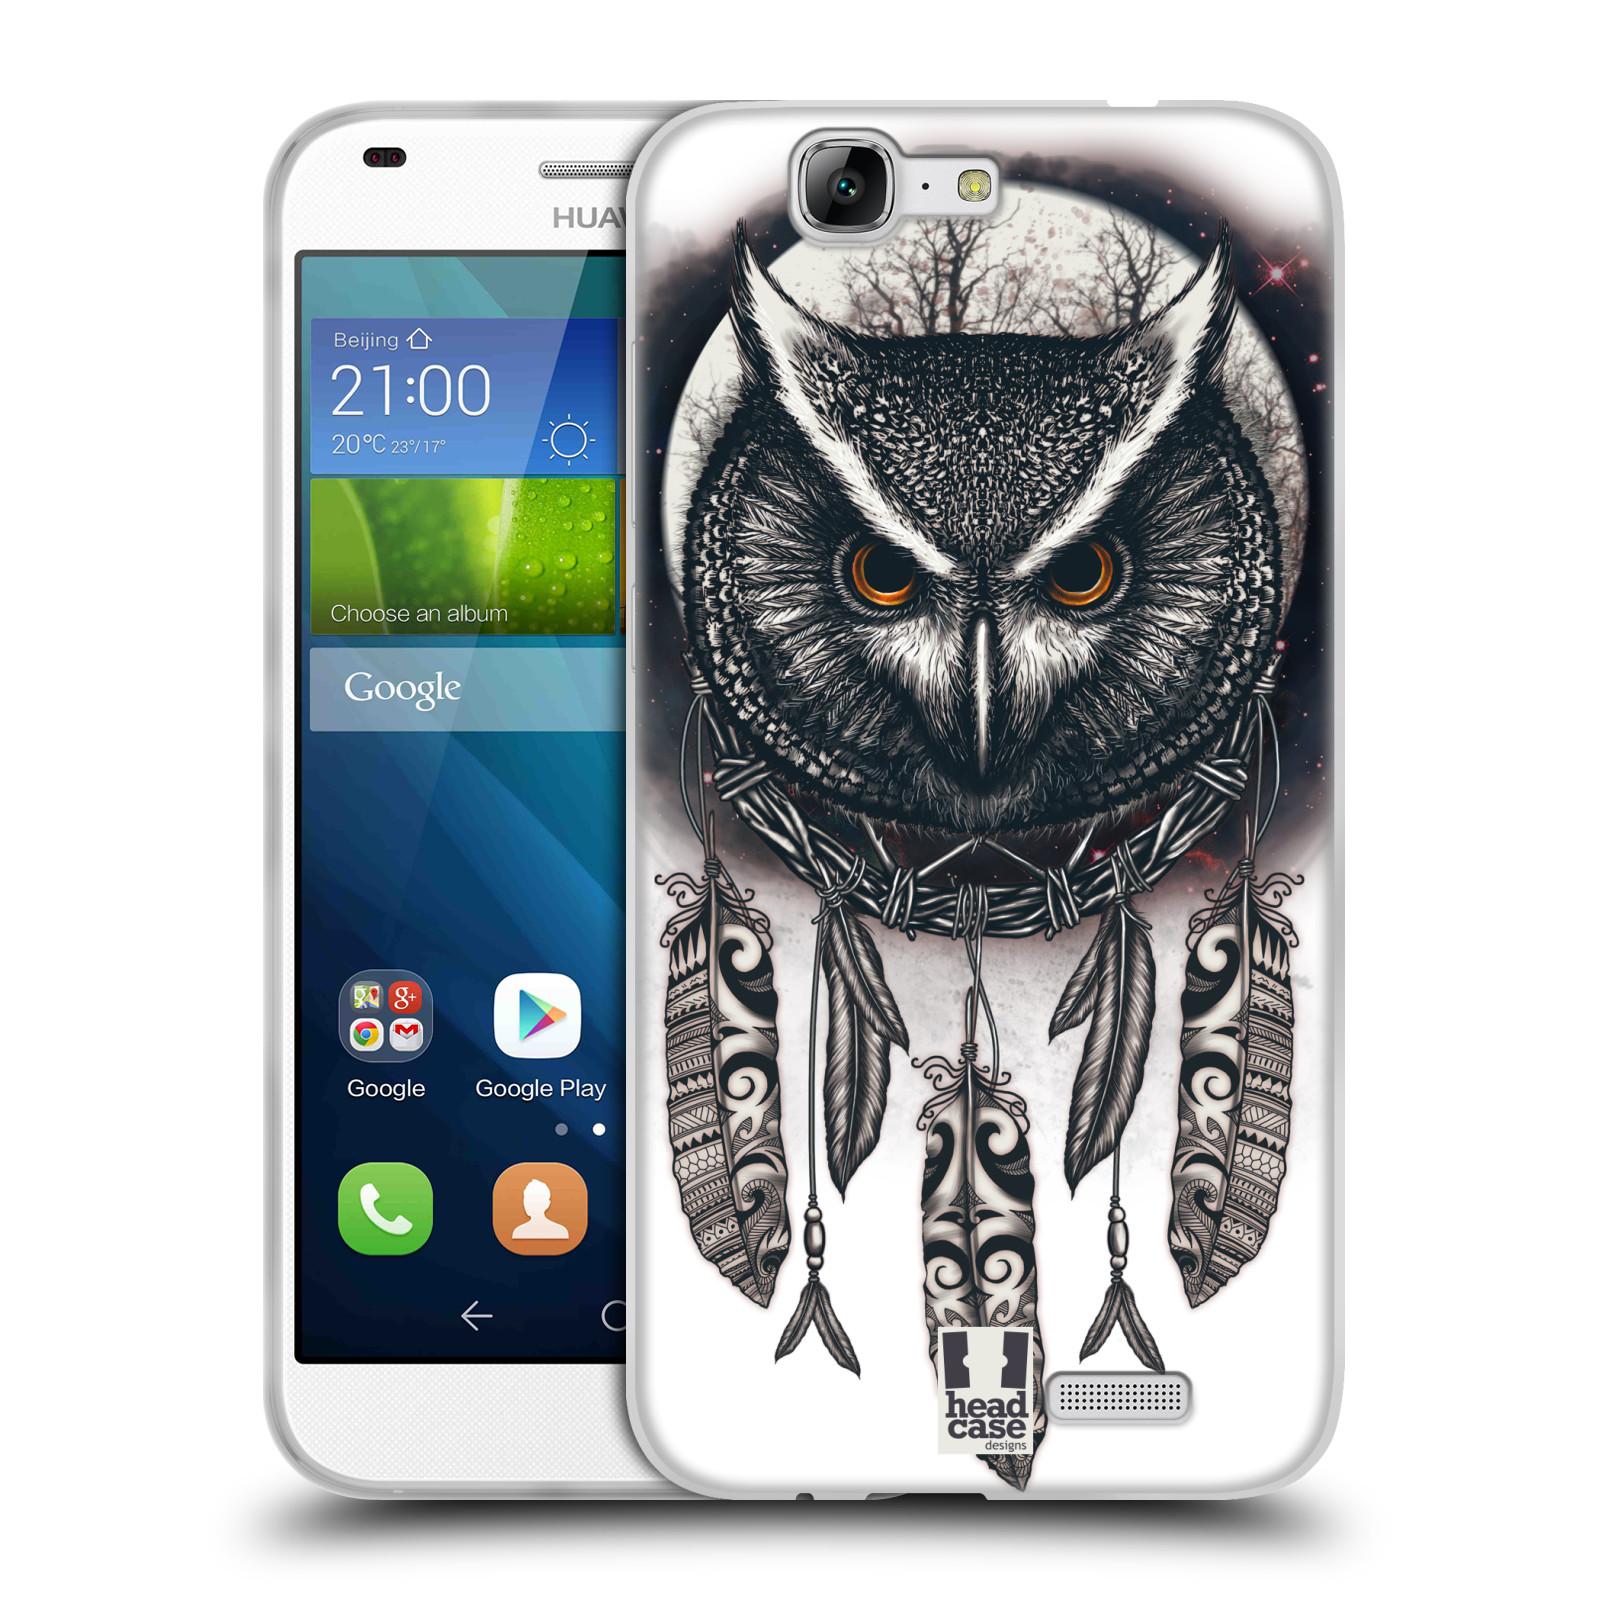 Silikonové pouzdro na mobil Huawei Ascend G7 - Head Case - Soví lapač